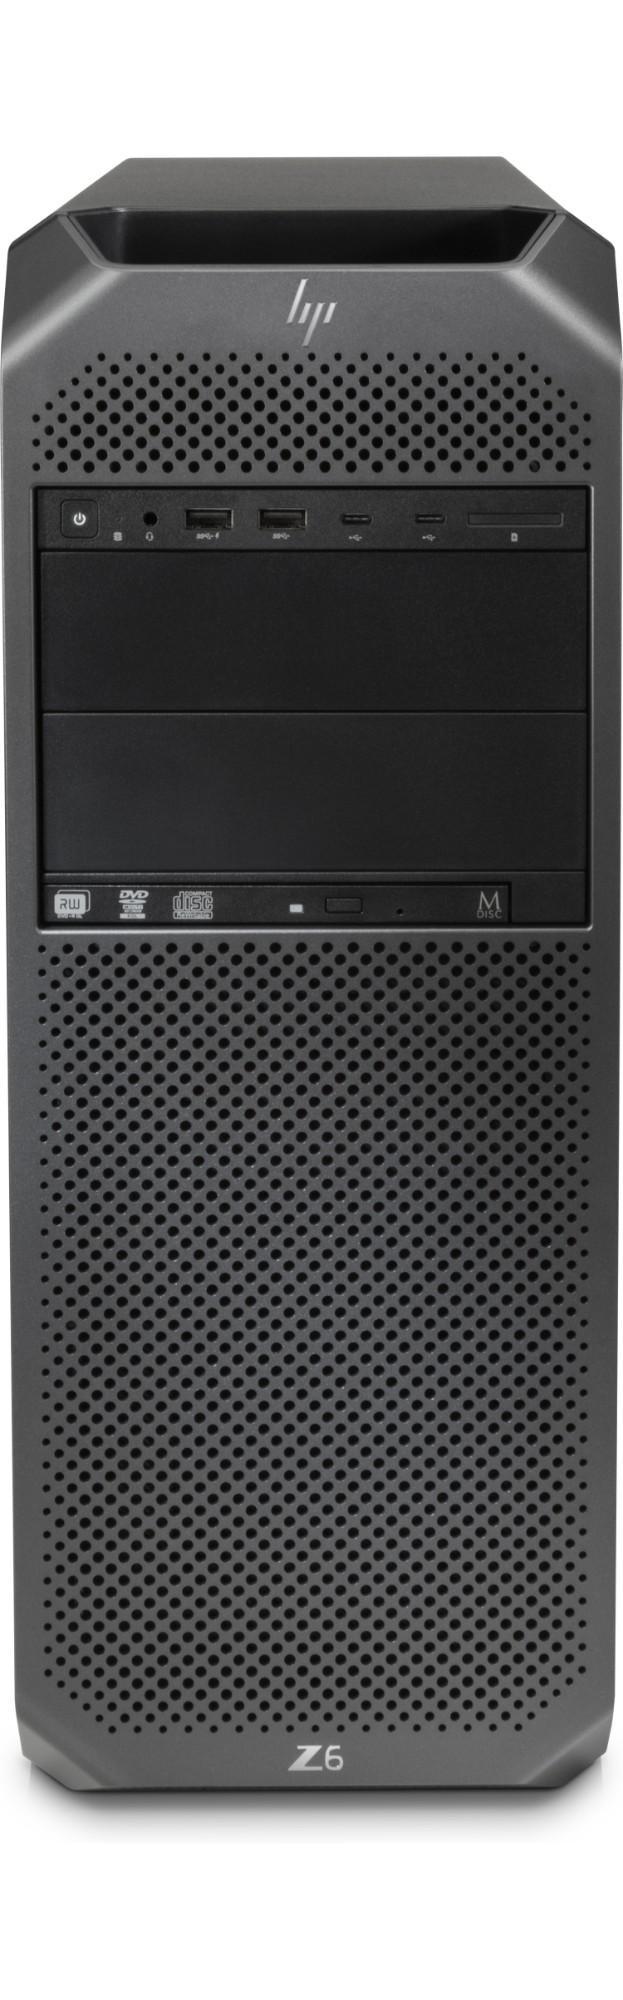 Workstation Z6 G4 MT - 4108 - 32GB RAM - 256GB SSD - Win10 Pro - Qwerty UK